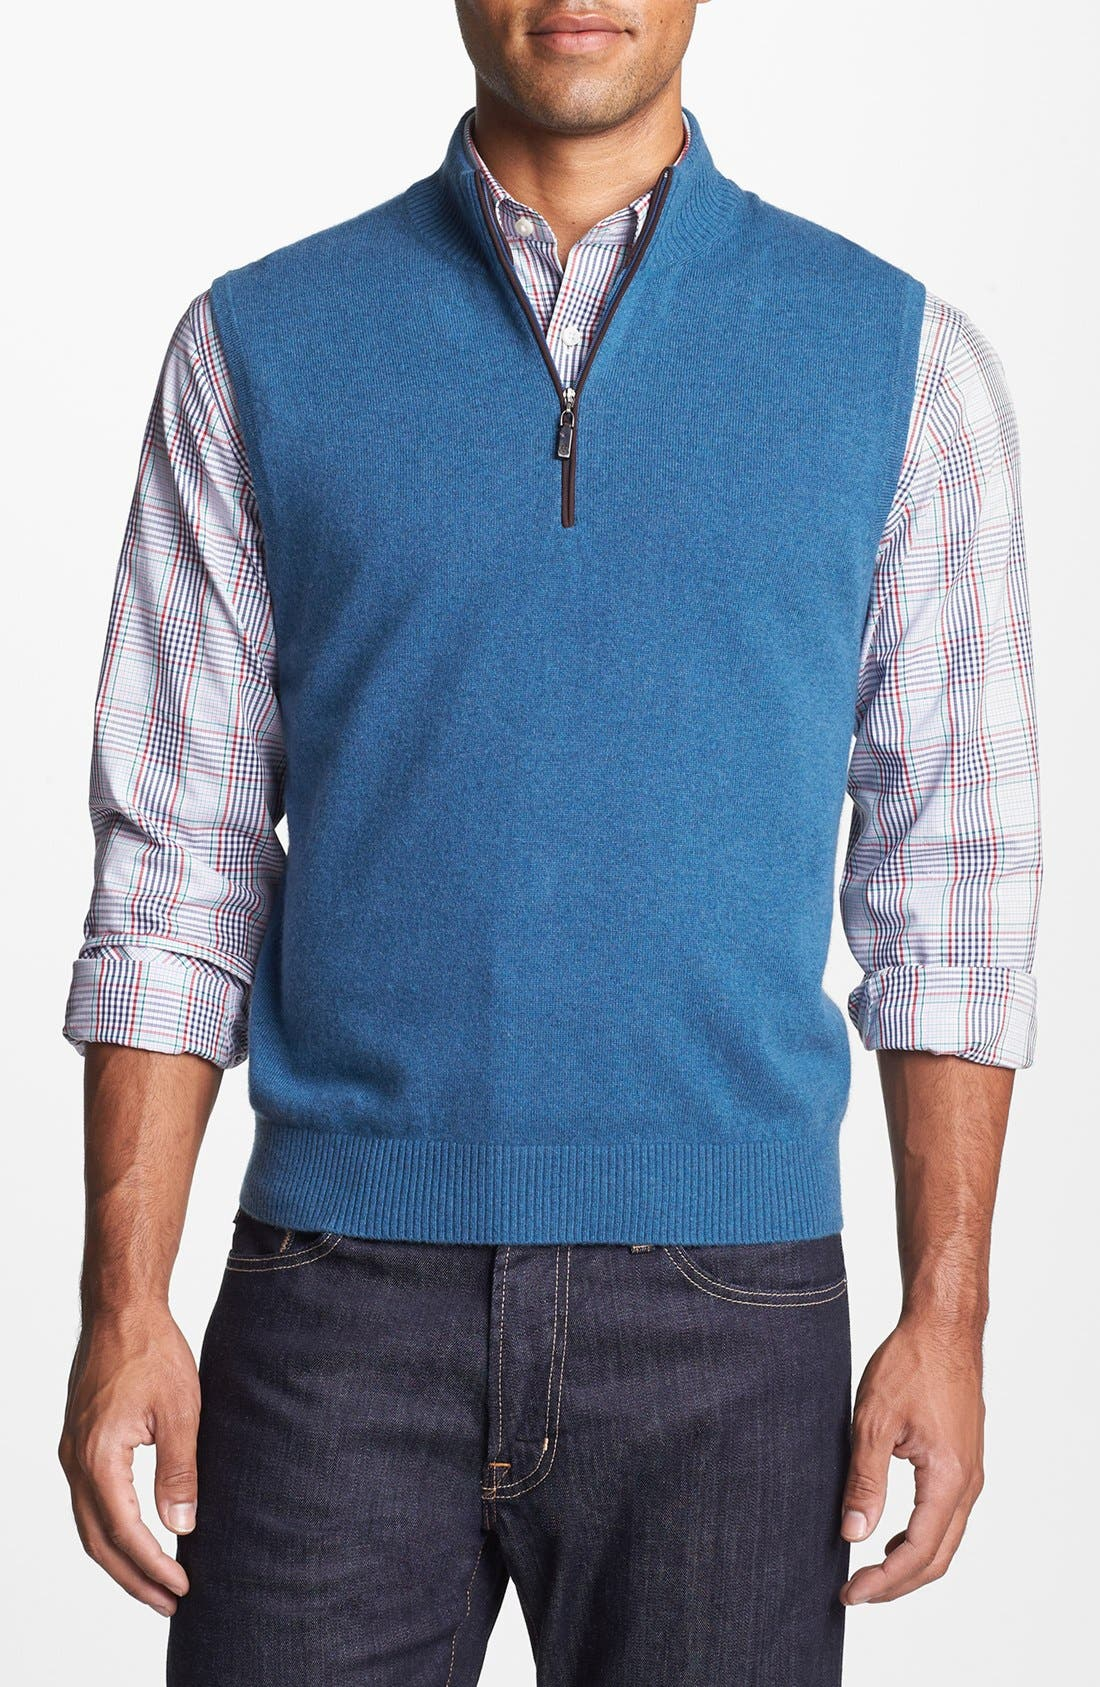 Main Image - Robert Talbott Quarter Zip Cashmere Vest